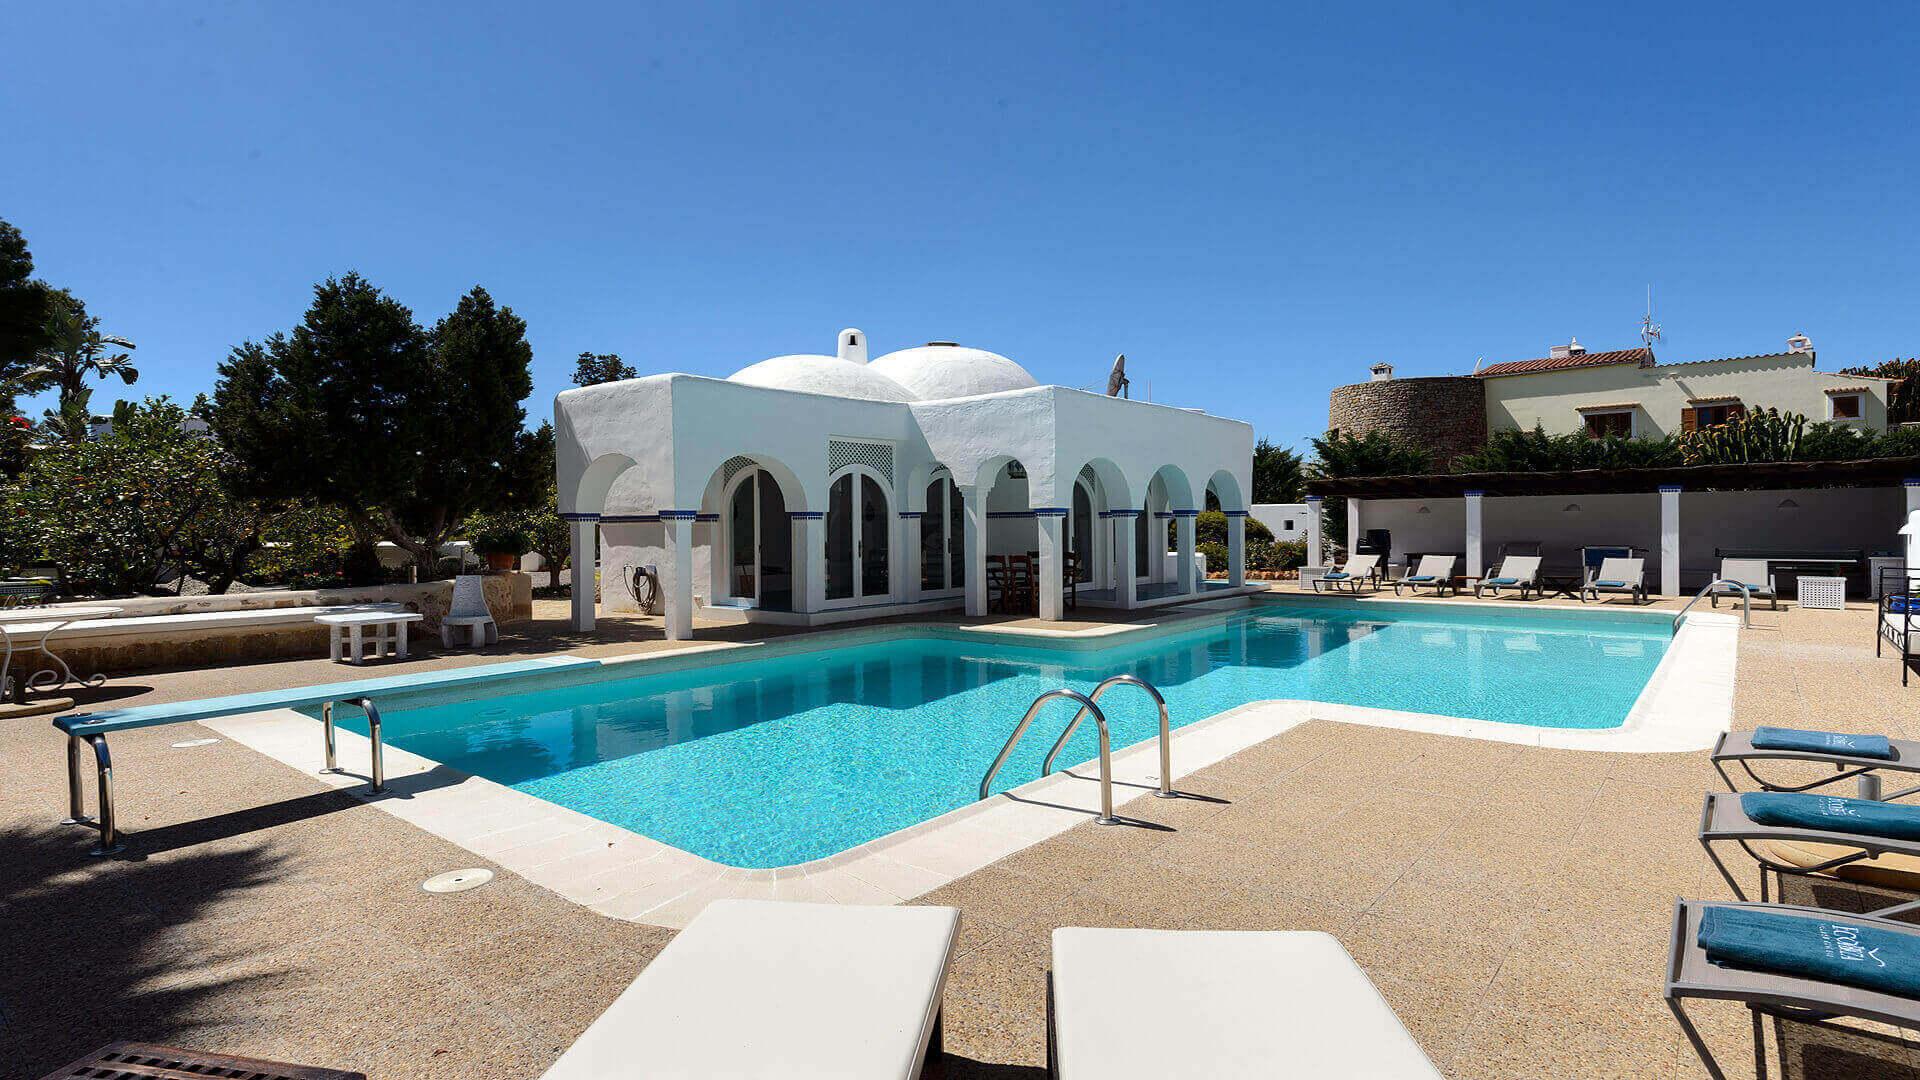 Villa Cigala Ibiza 5 Santa Eulalia